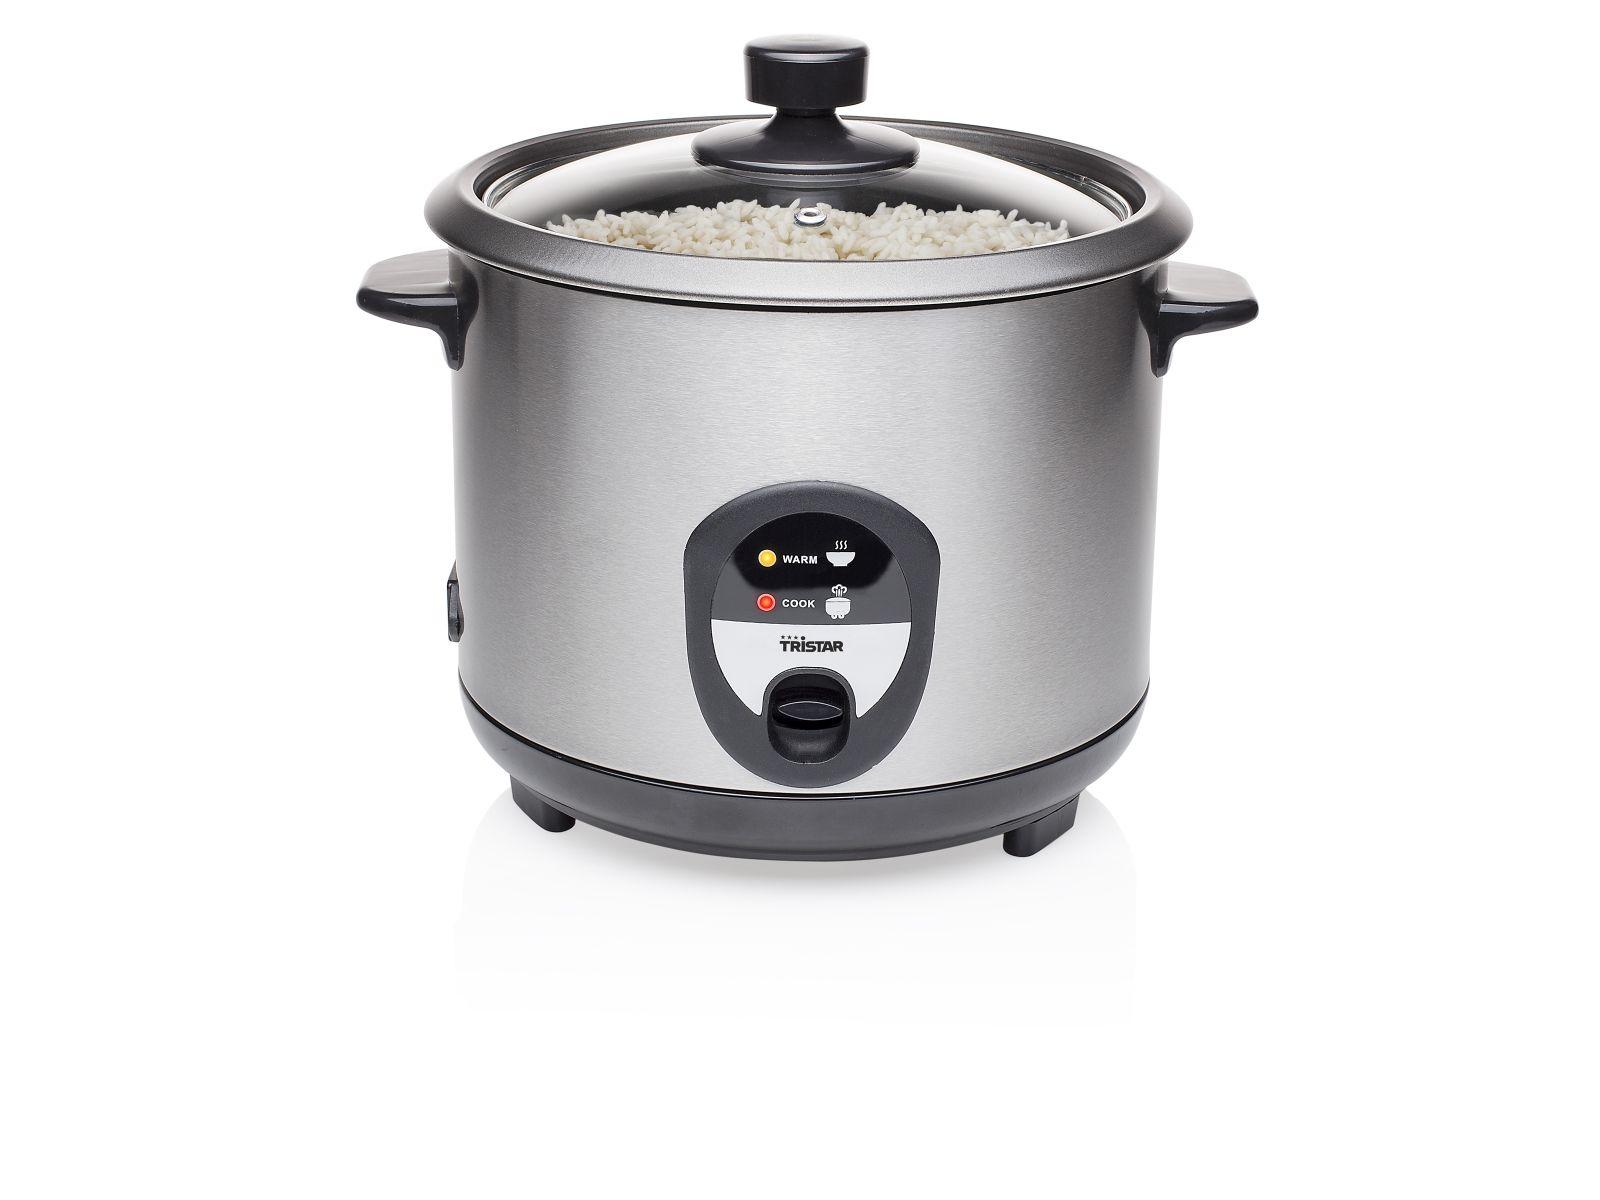 TRISTAR Vařič rýže - Rýžovar Tristar RK-6127 - 1,5l